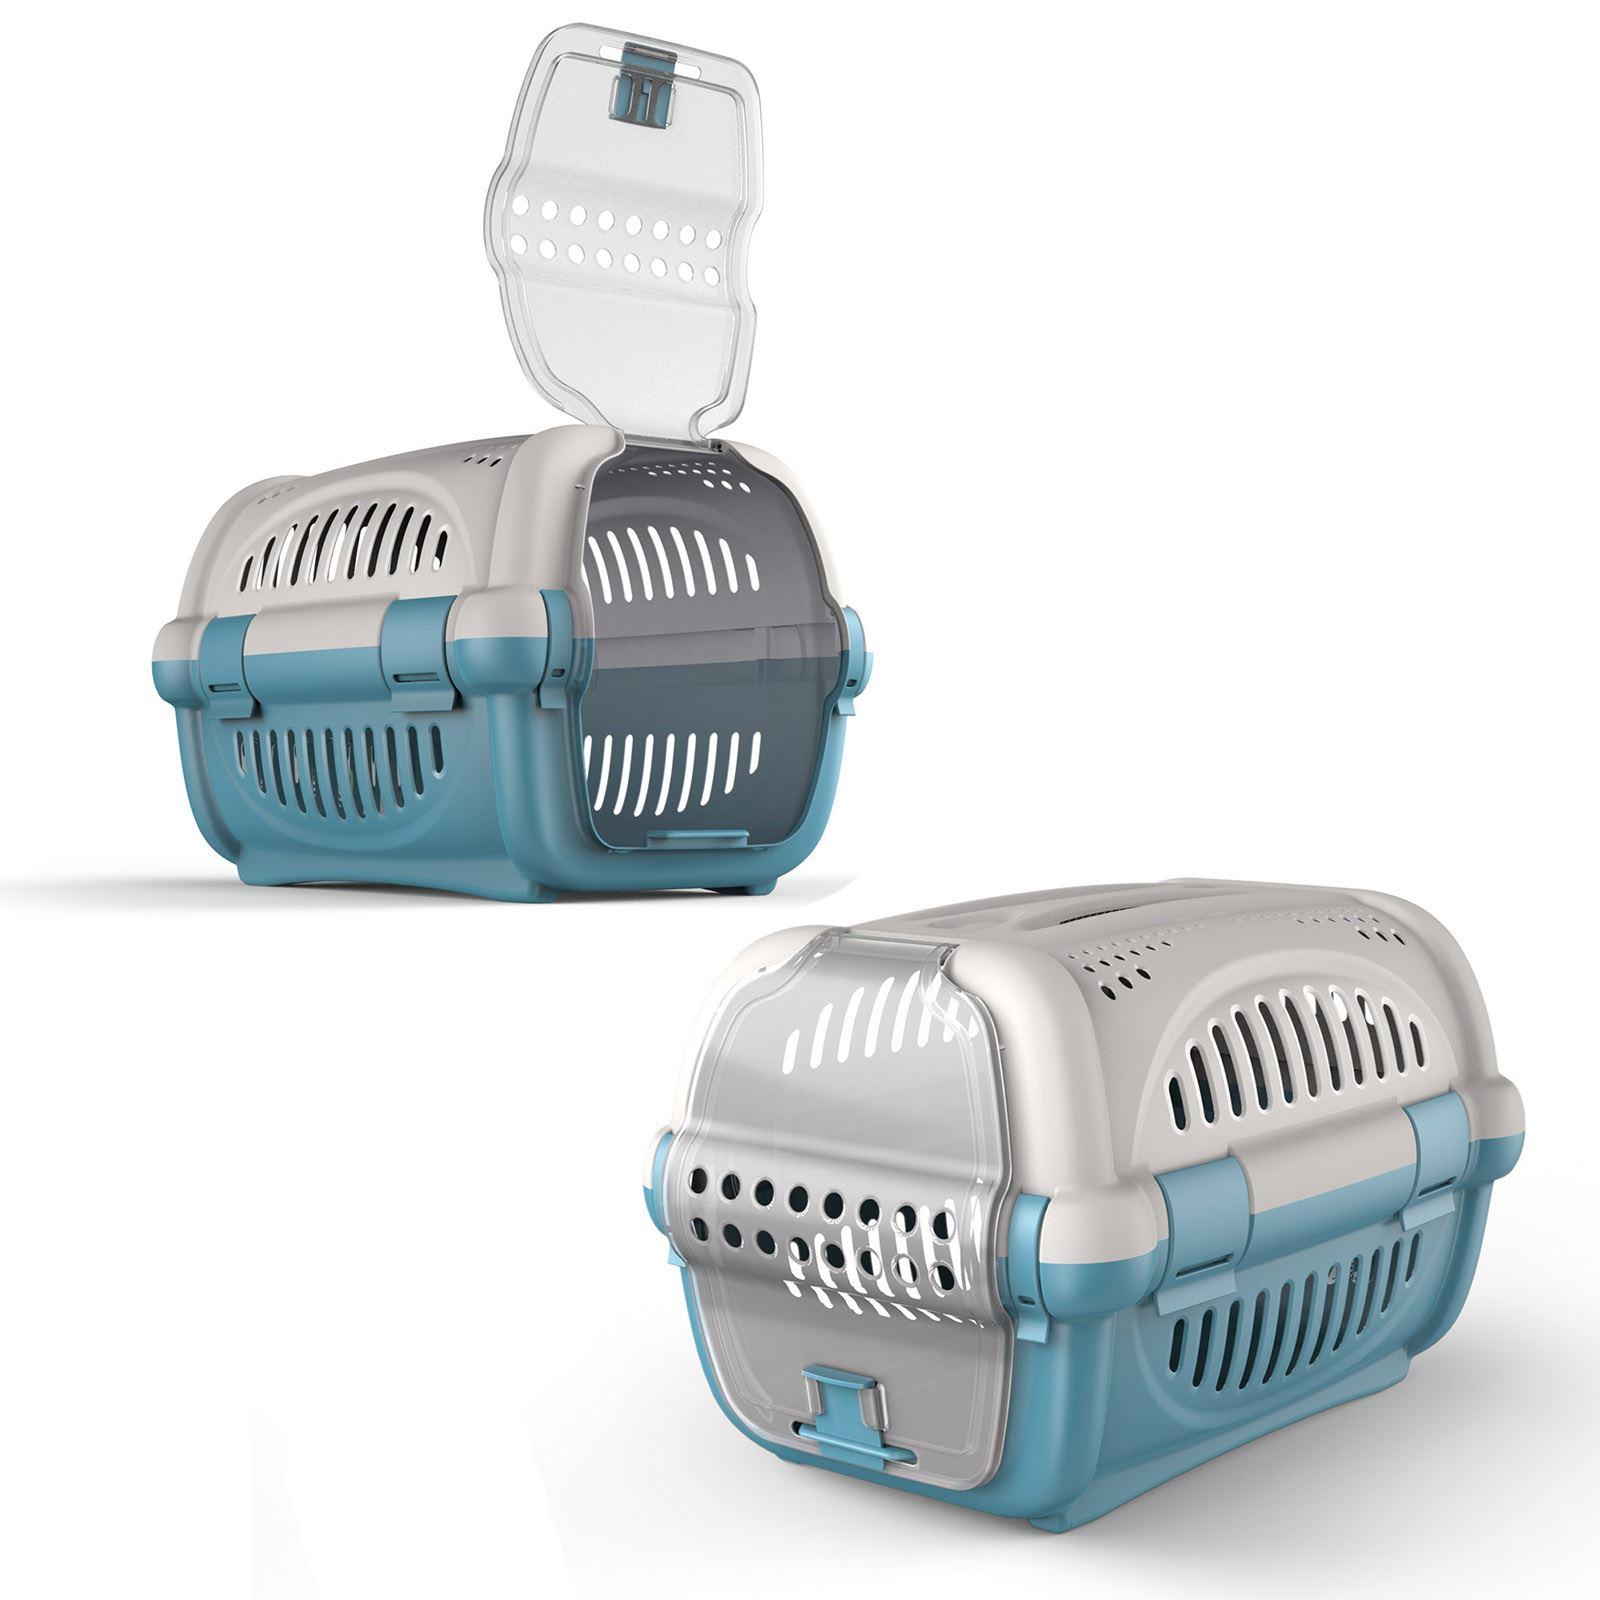 Pet-Premium-Carrier-Kitten-Cat-Dog-Transport-Travel-Box-Cage-Vet-Carry